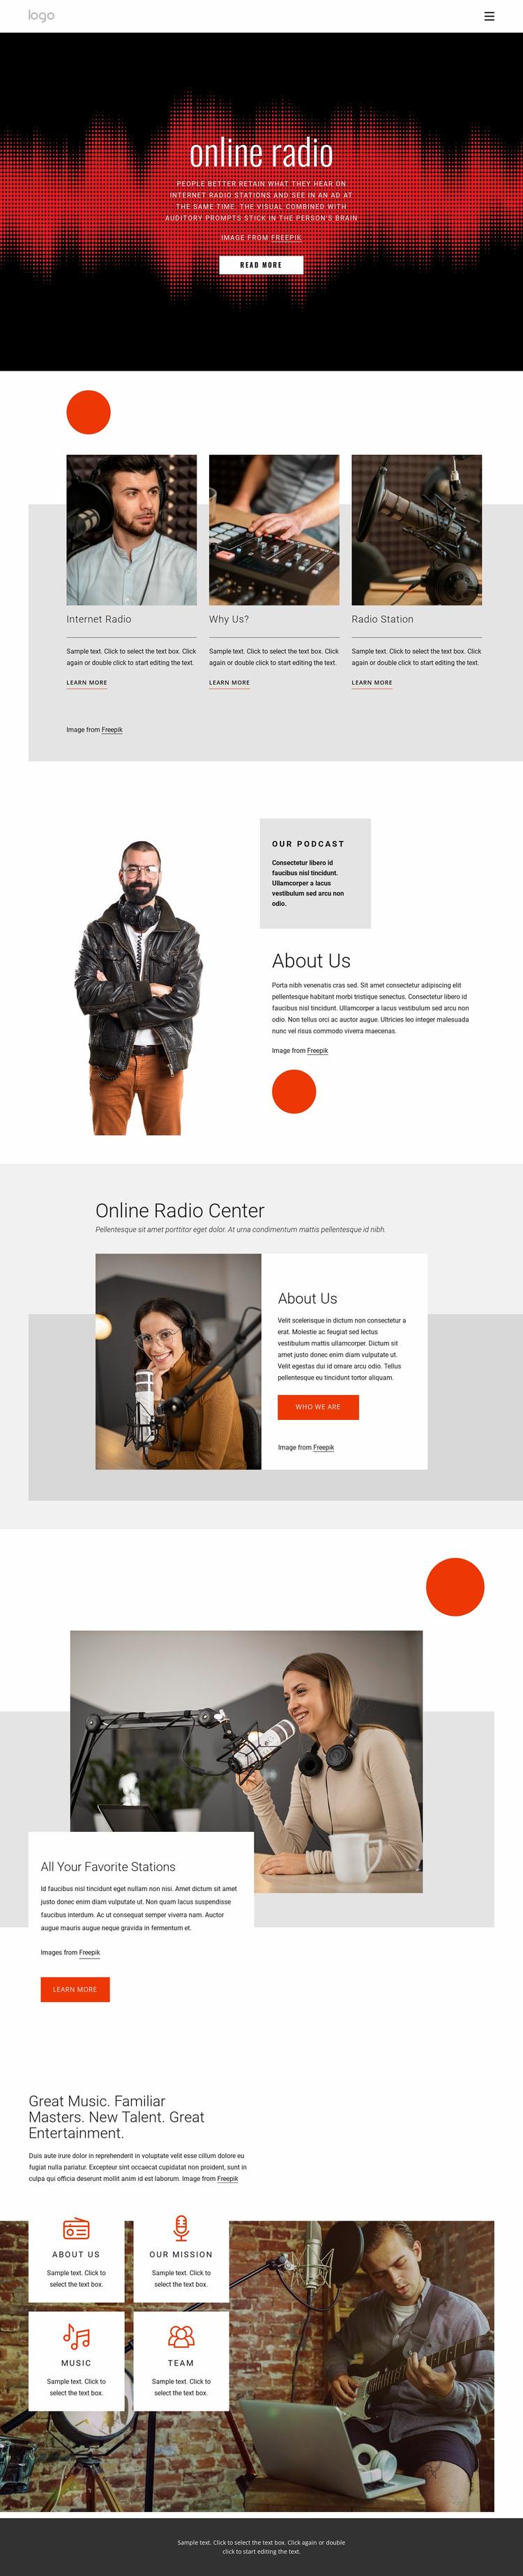 Online radio shows Website Template